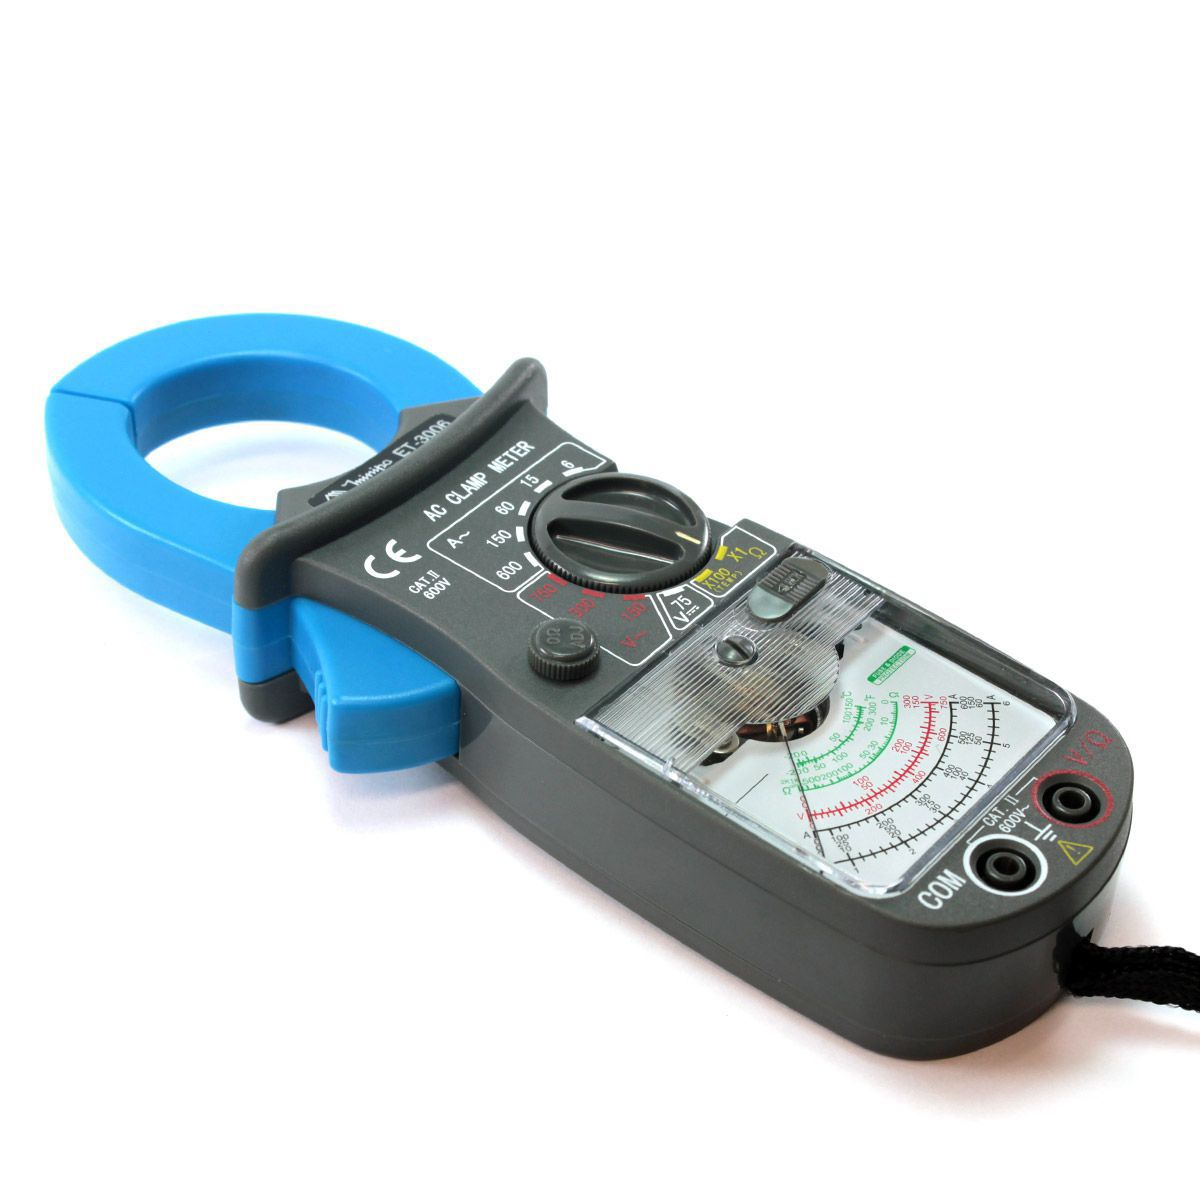 Alicate Amperímetro Analógico Profissional Minipa ET-3006A  - EMPORIO K